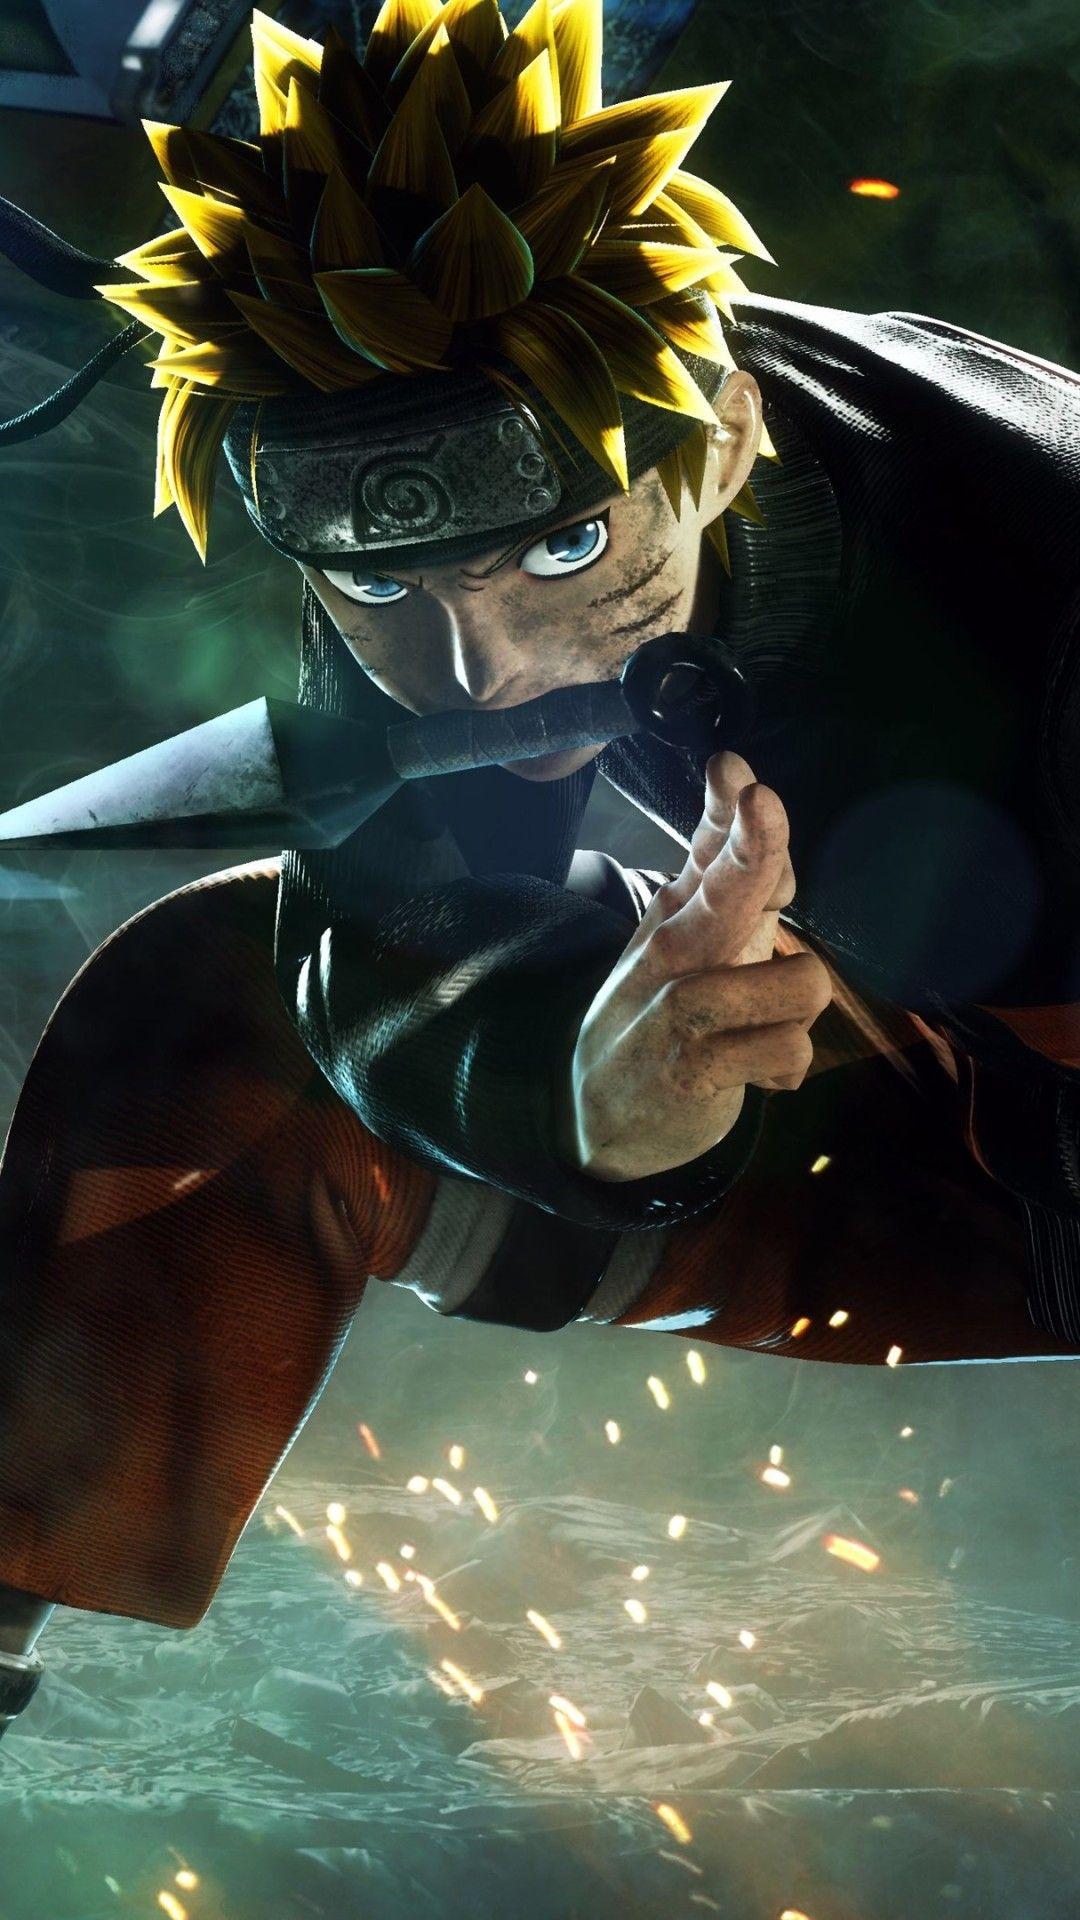 Pin De Manzoorhusdain Em Naruto Wallpaper Em 2020 Arte Naruto Papeis De Parede Para Download Naruto